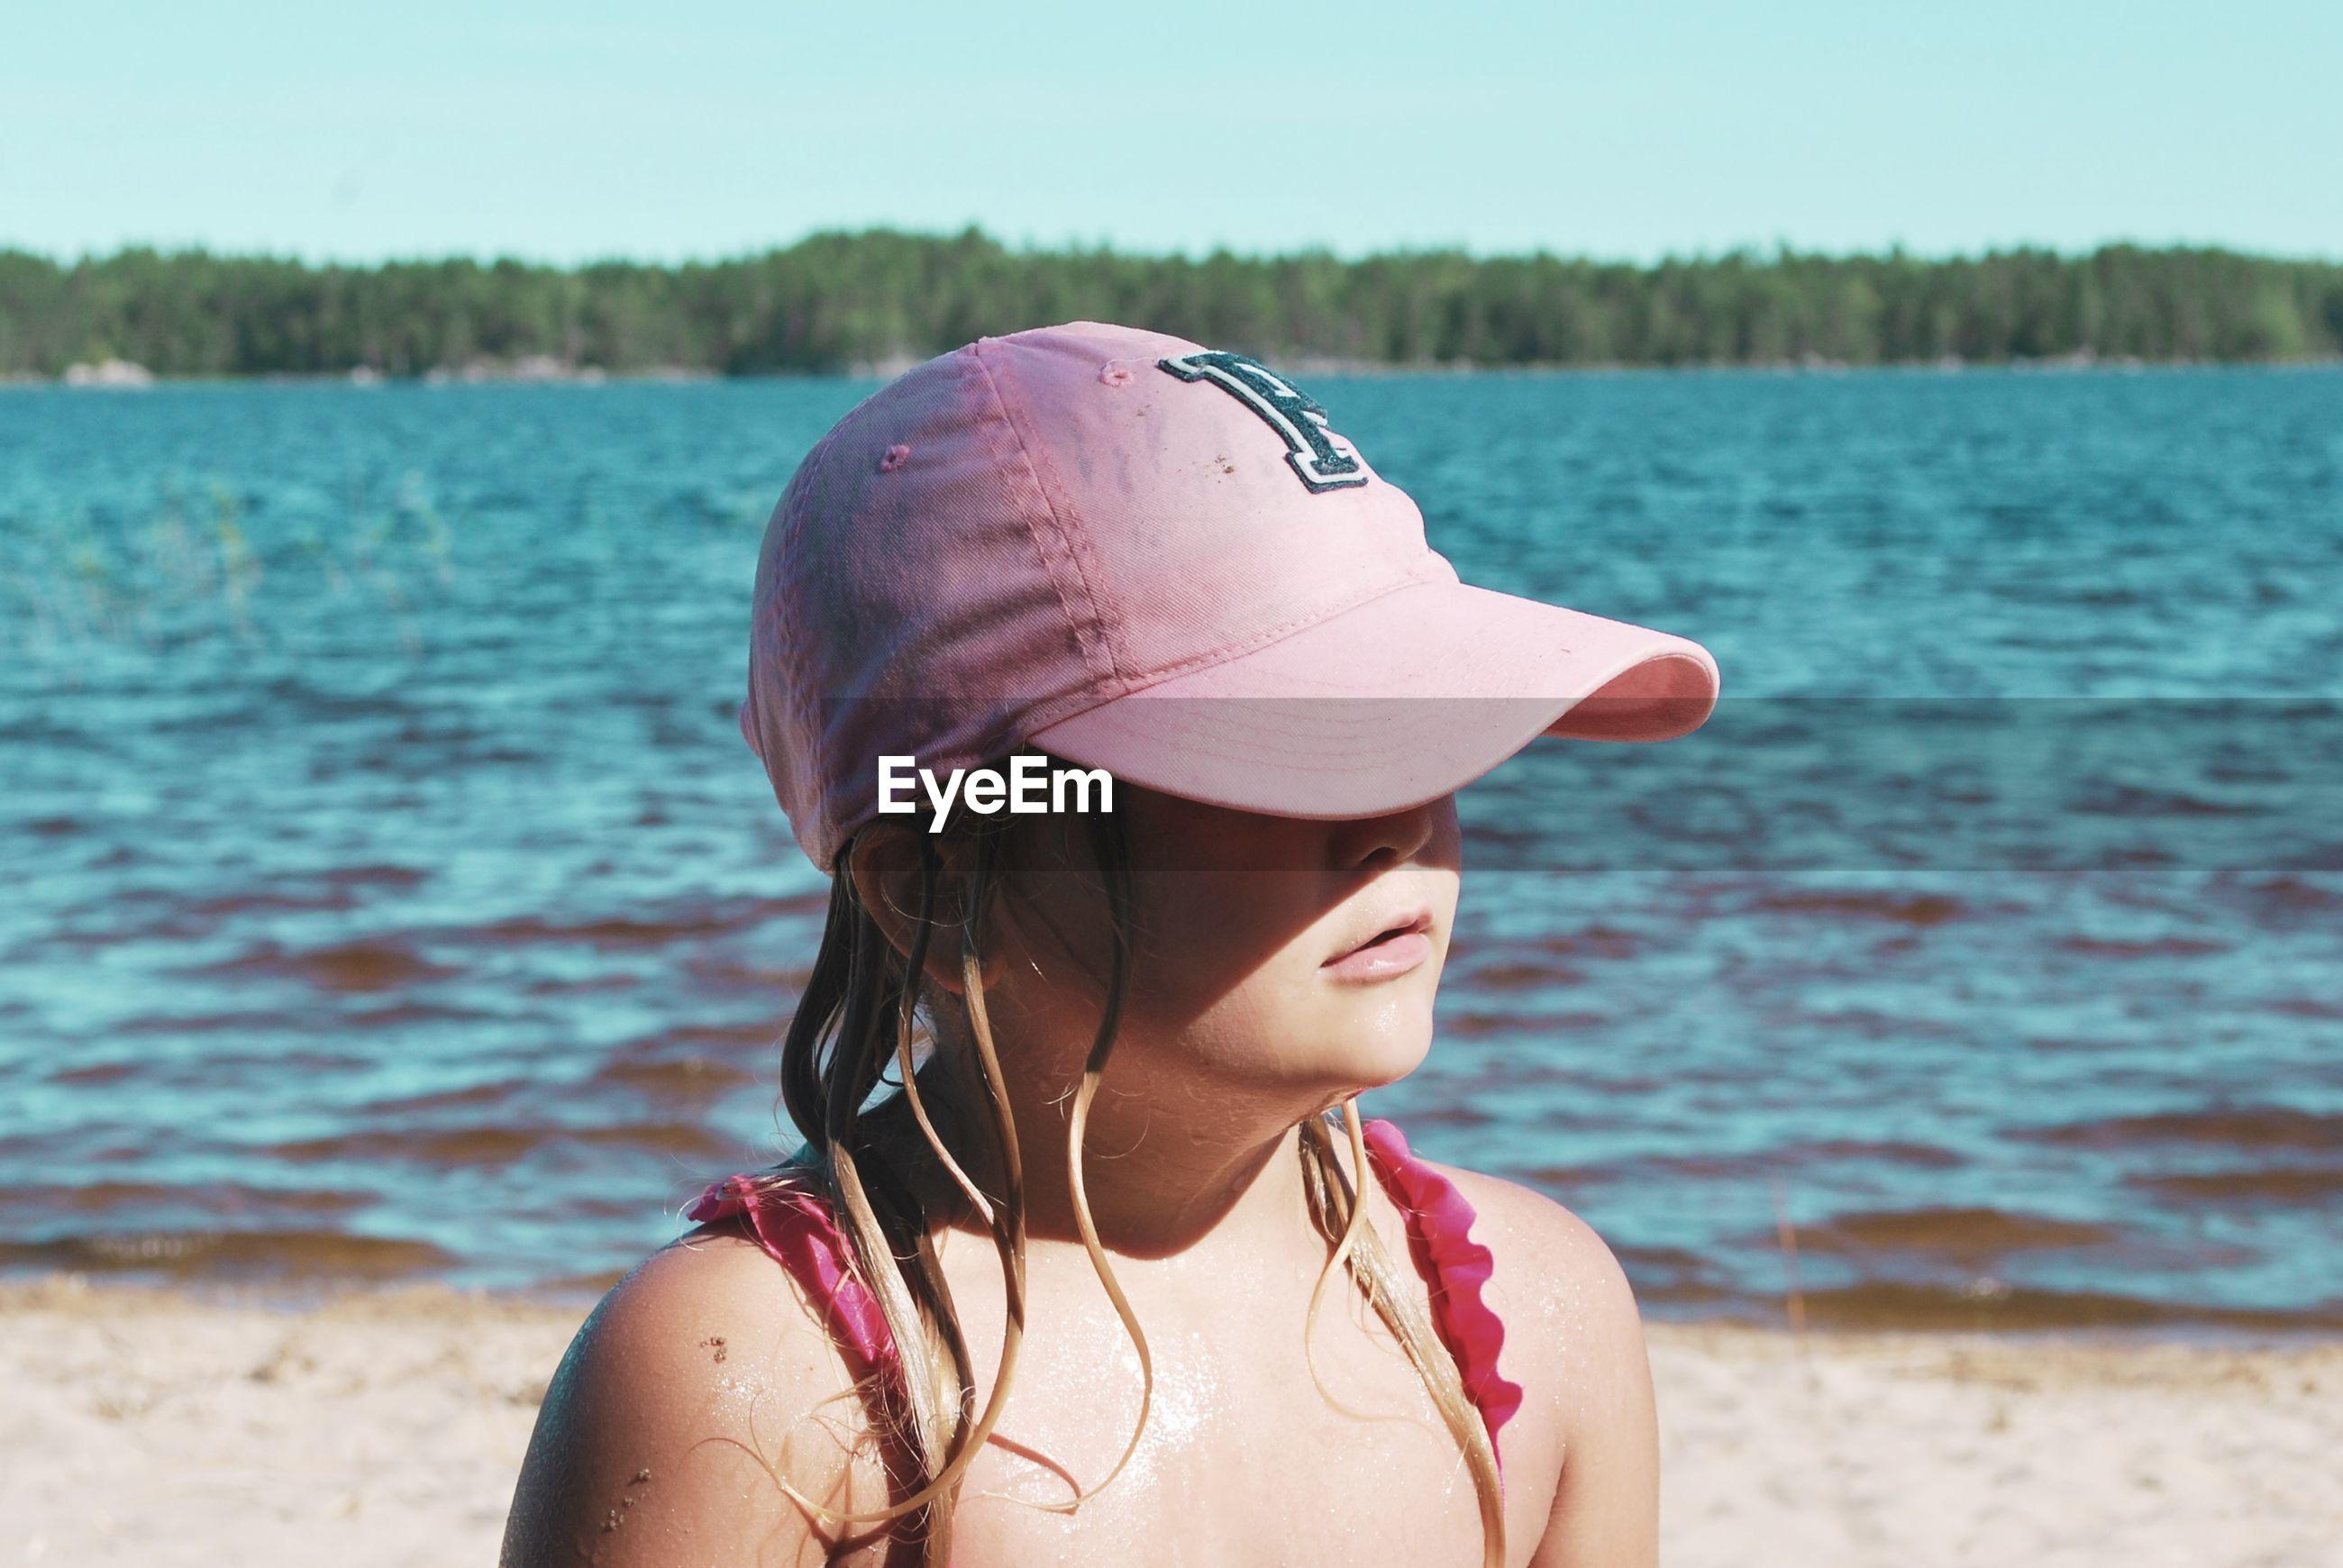 Close-up of girl wearing cap at beach